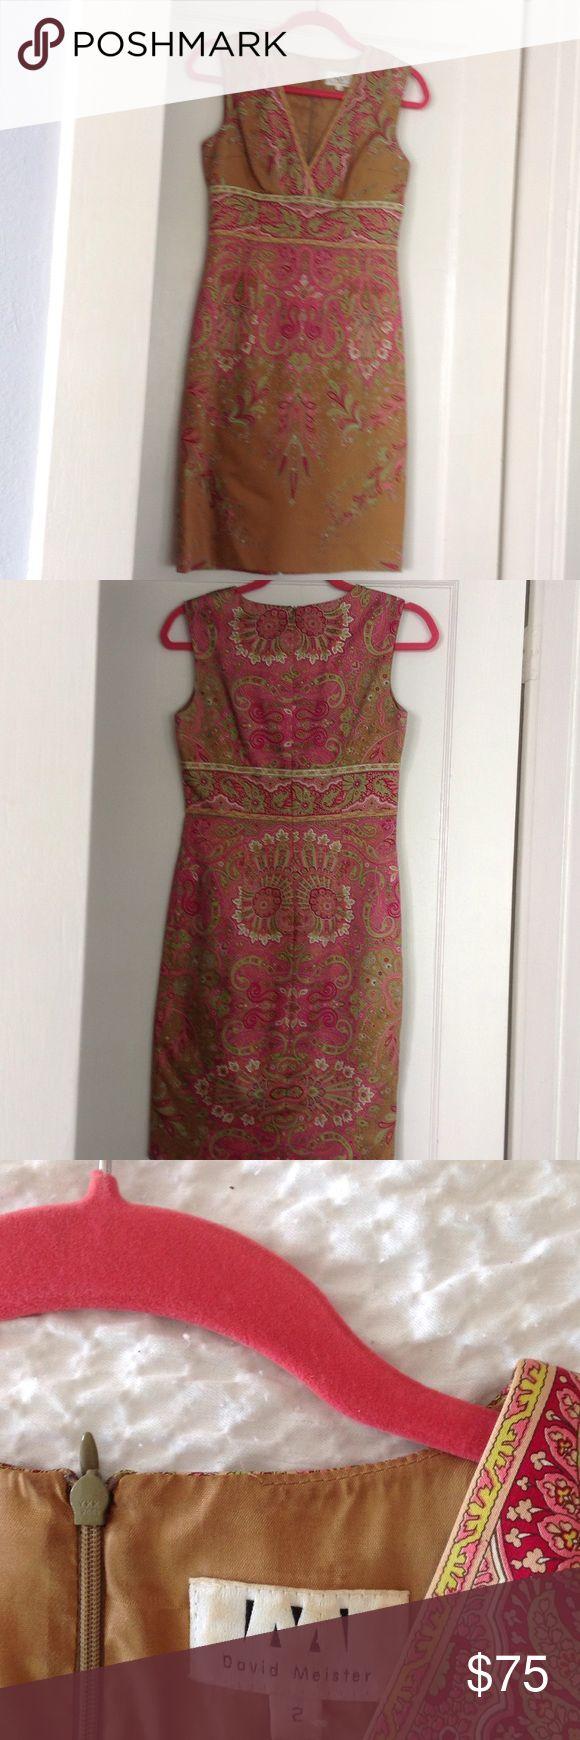 Vintage David Meister Form Fitting Dress! Low cut, high waisted, curve hugging vintage print dress, looks amazing on! David Meister Dresses